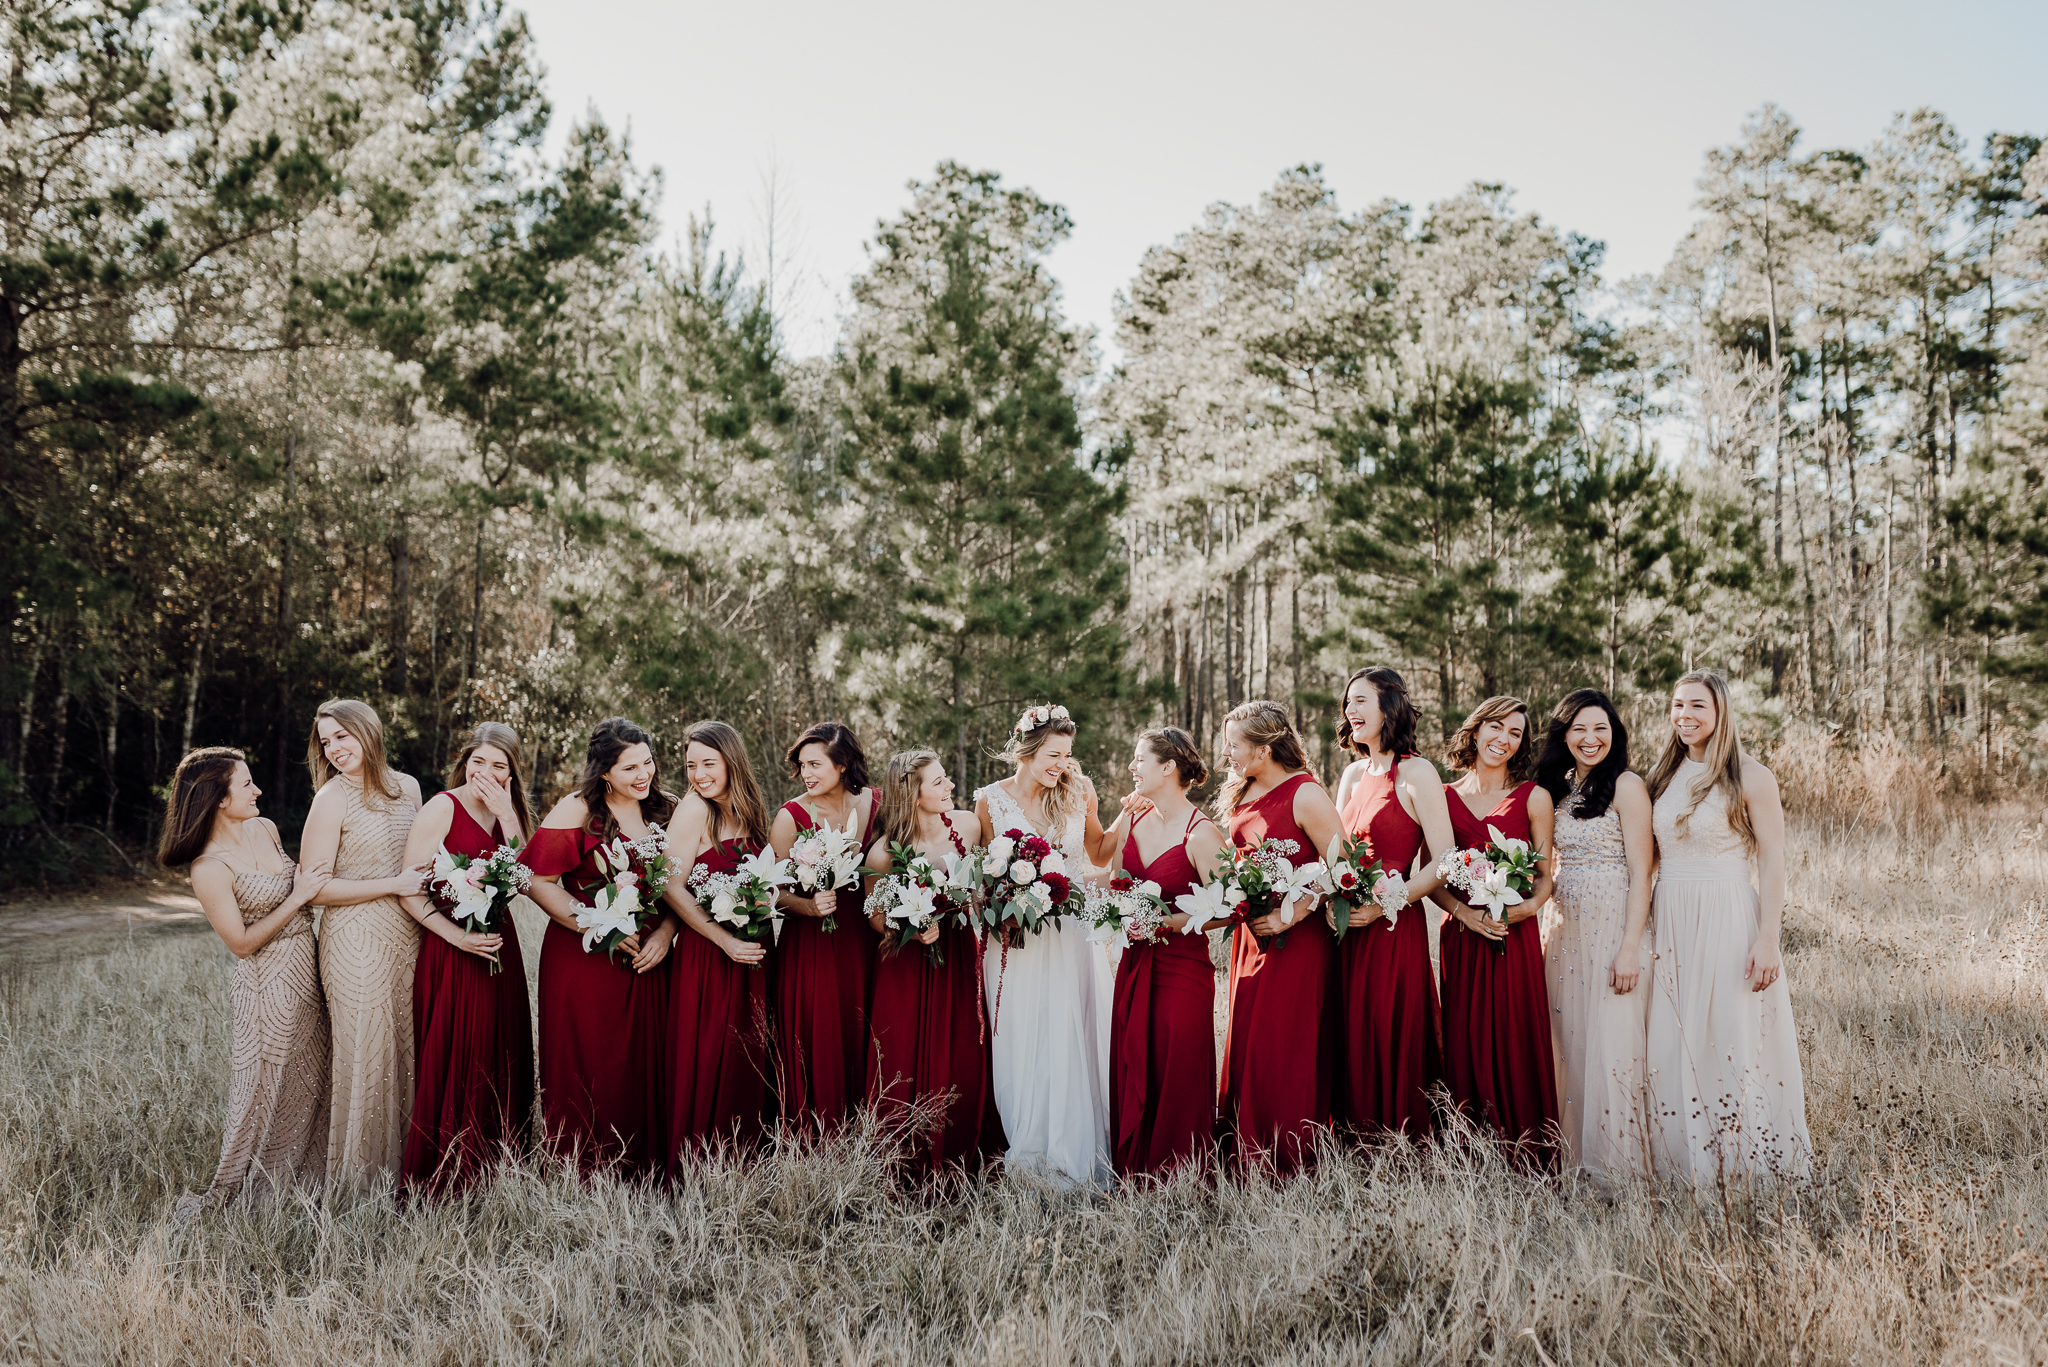 Michelle + Aron-Houston Wedding Photographer-Magnolia Meadows-Winter Wedding | Kristen Giles Photography - 024.jpg